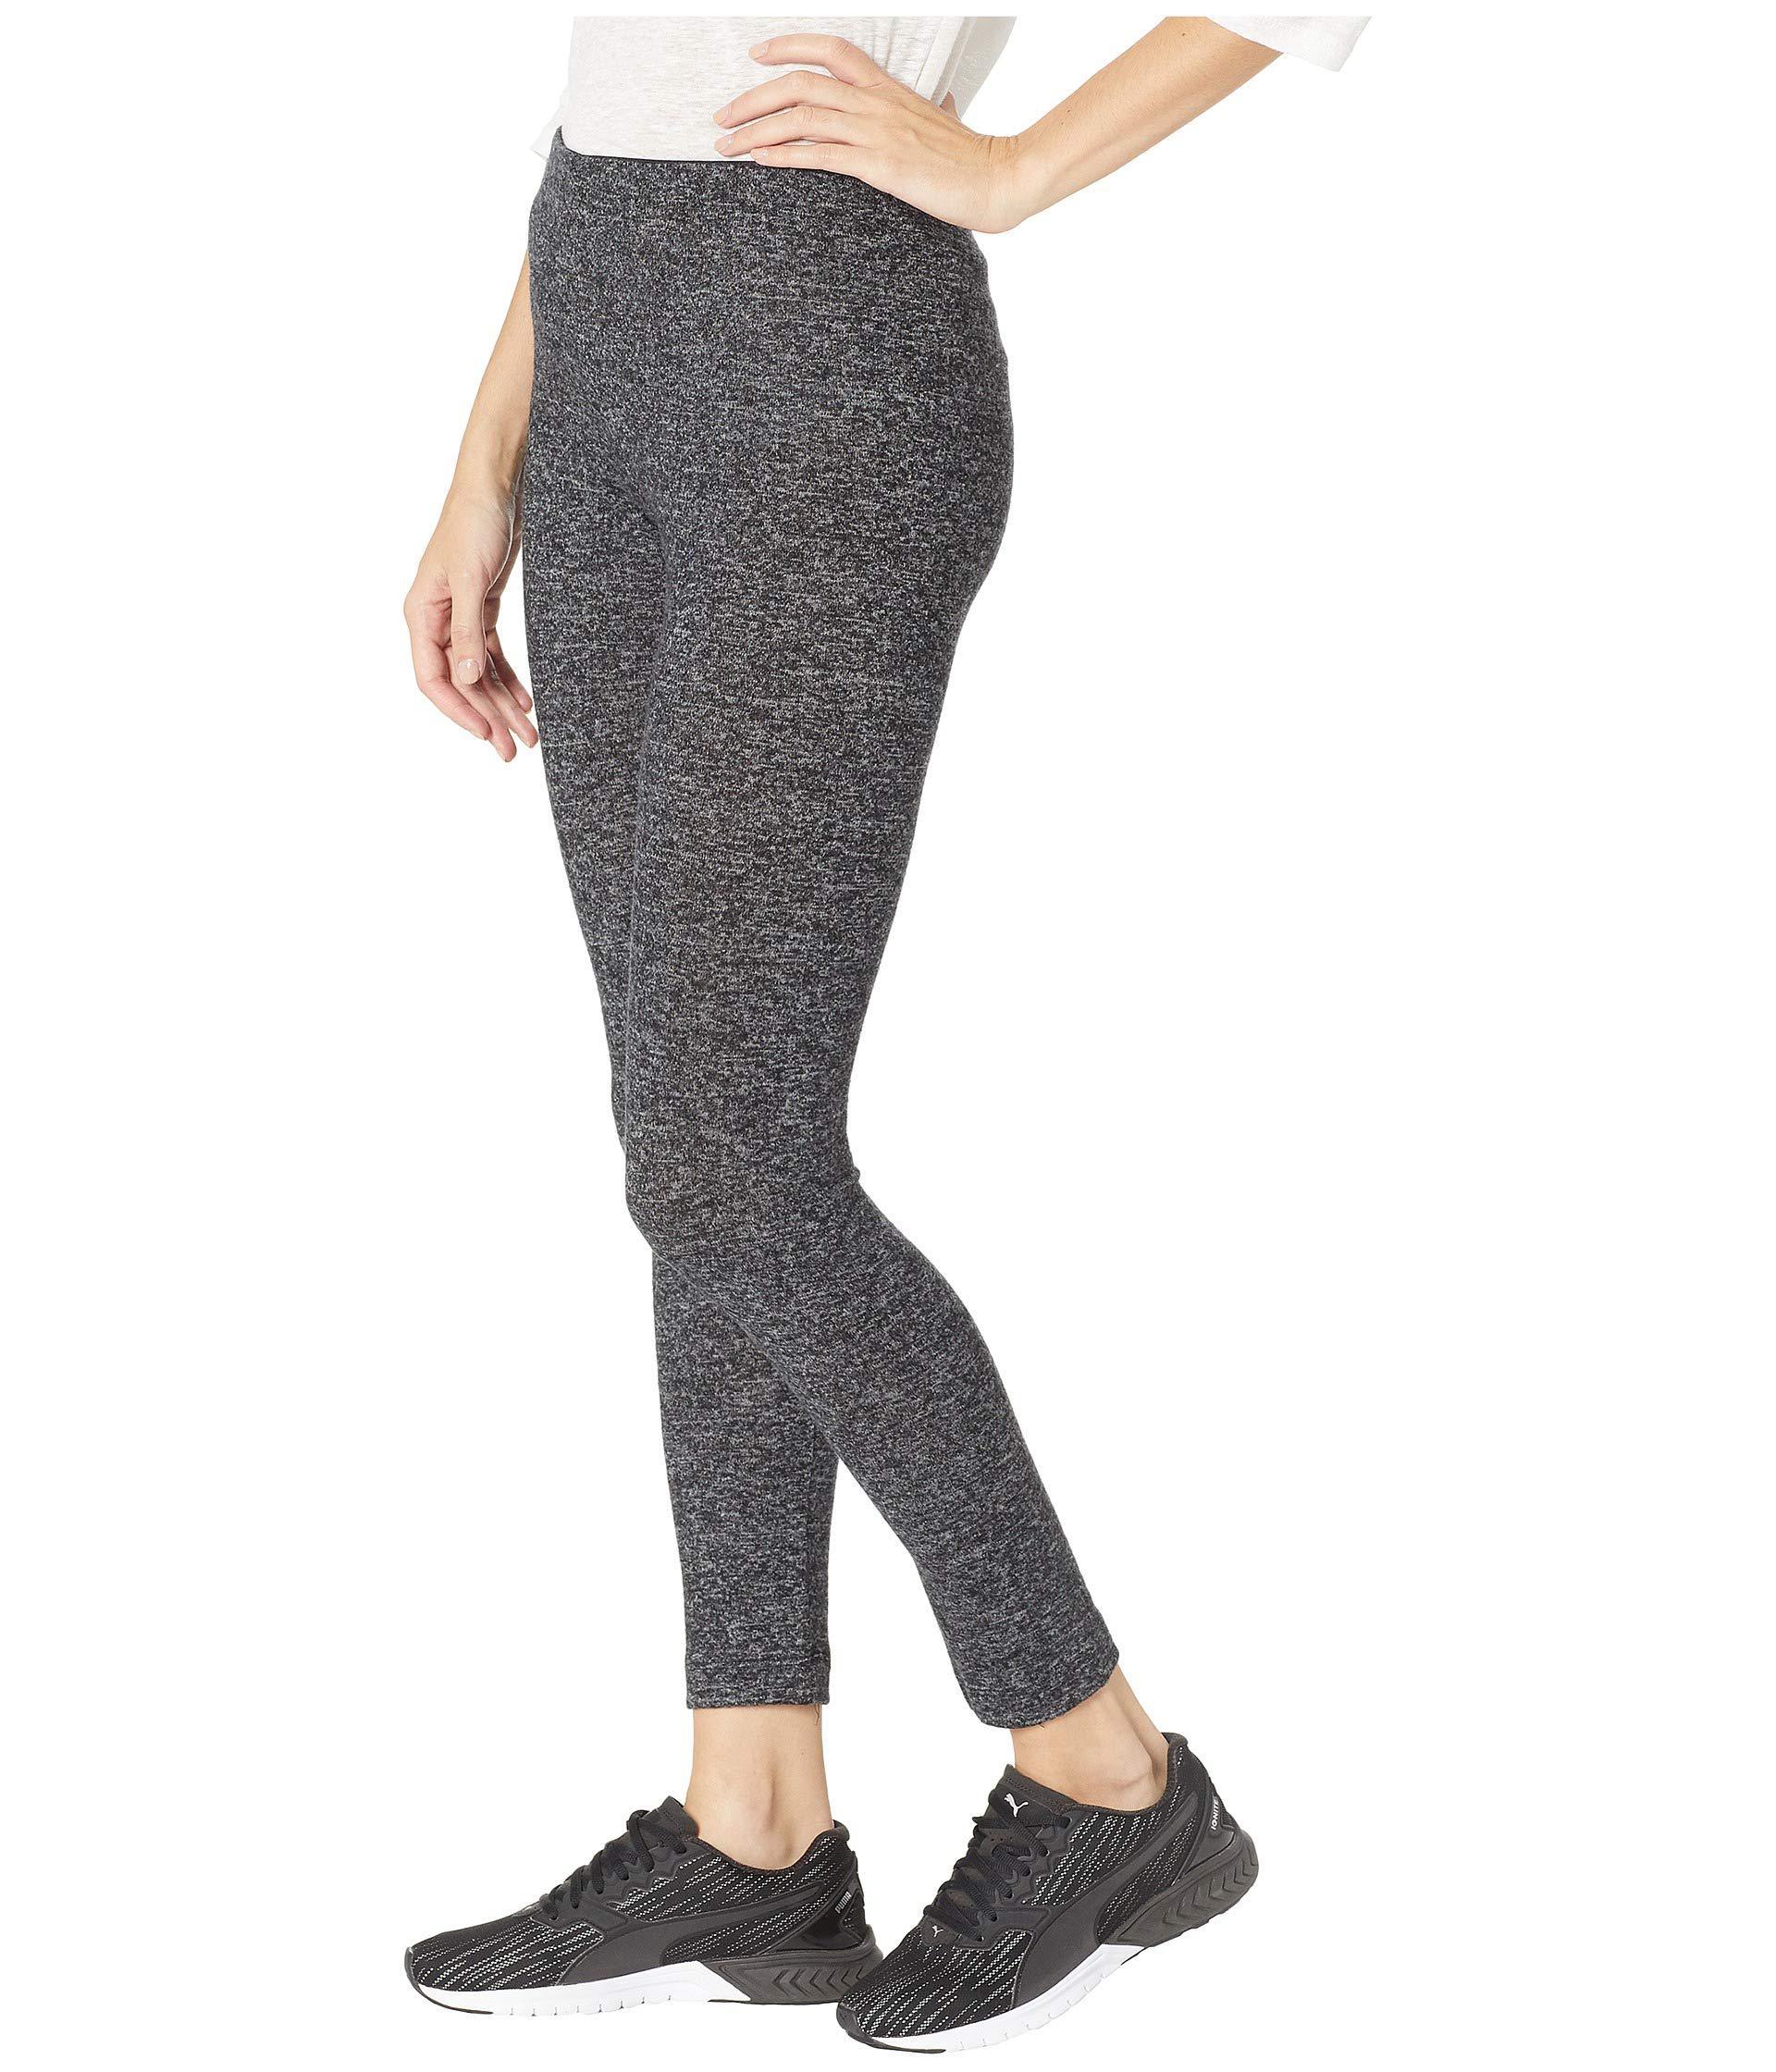 4f56304c0eda49 Lyst - Nally & Millie Brushed Leggings in Black - Save 17%